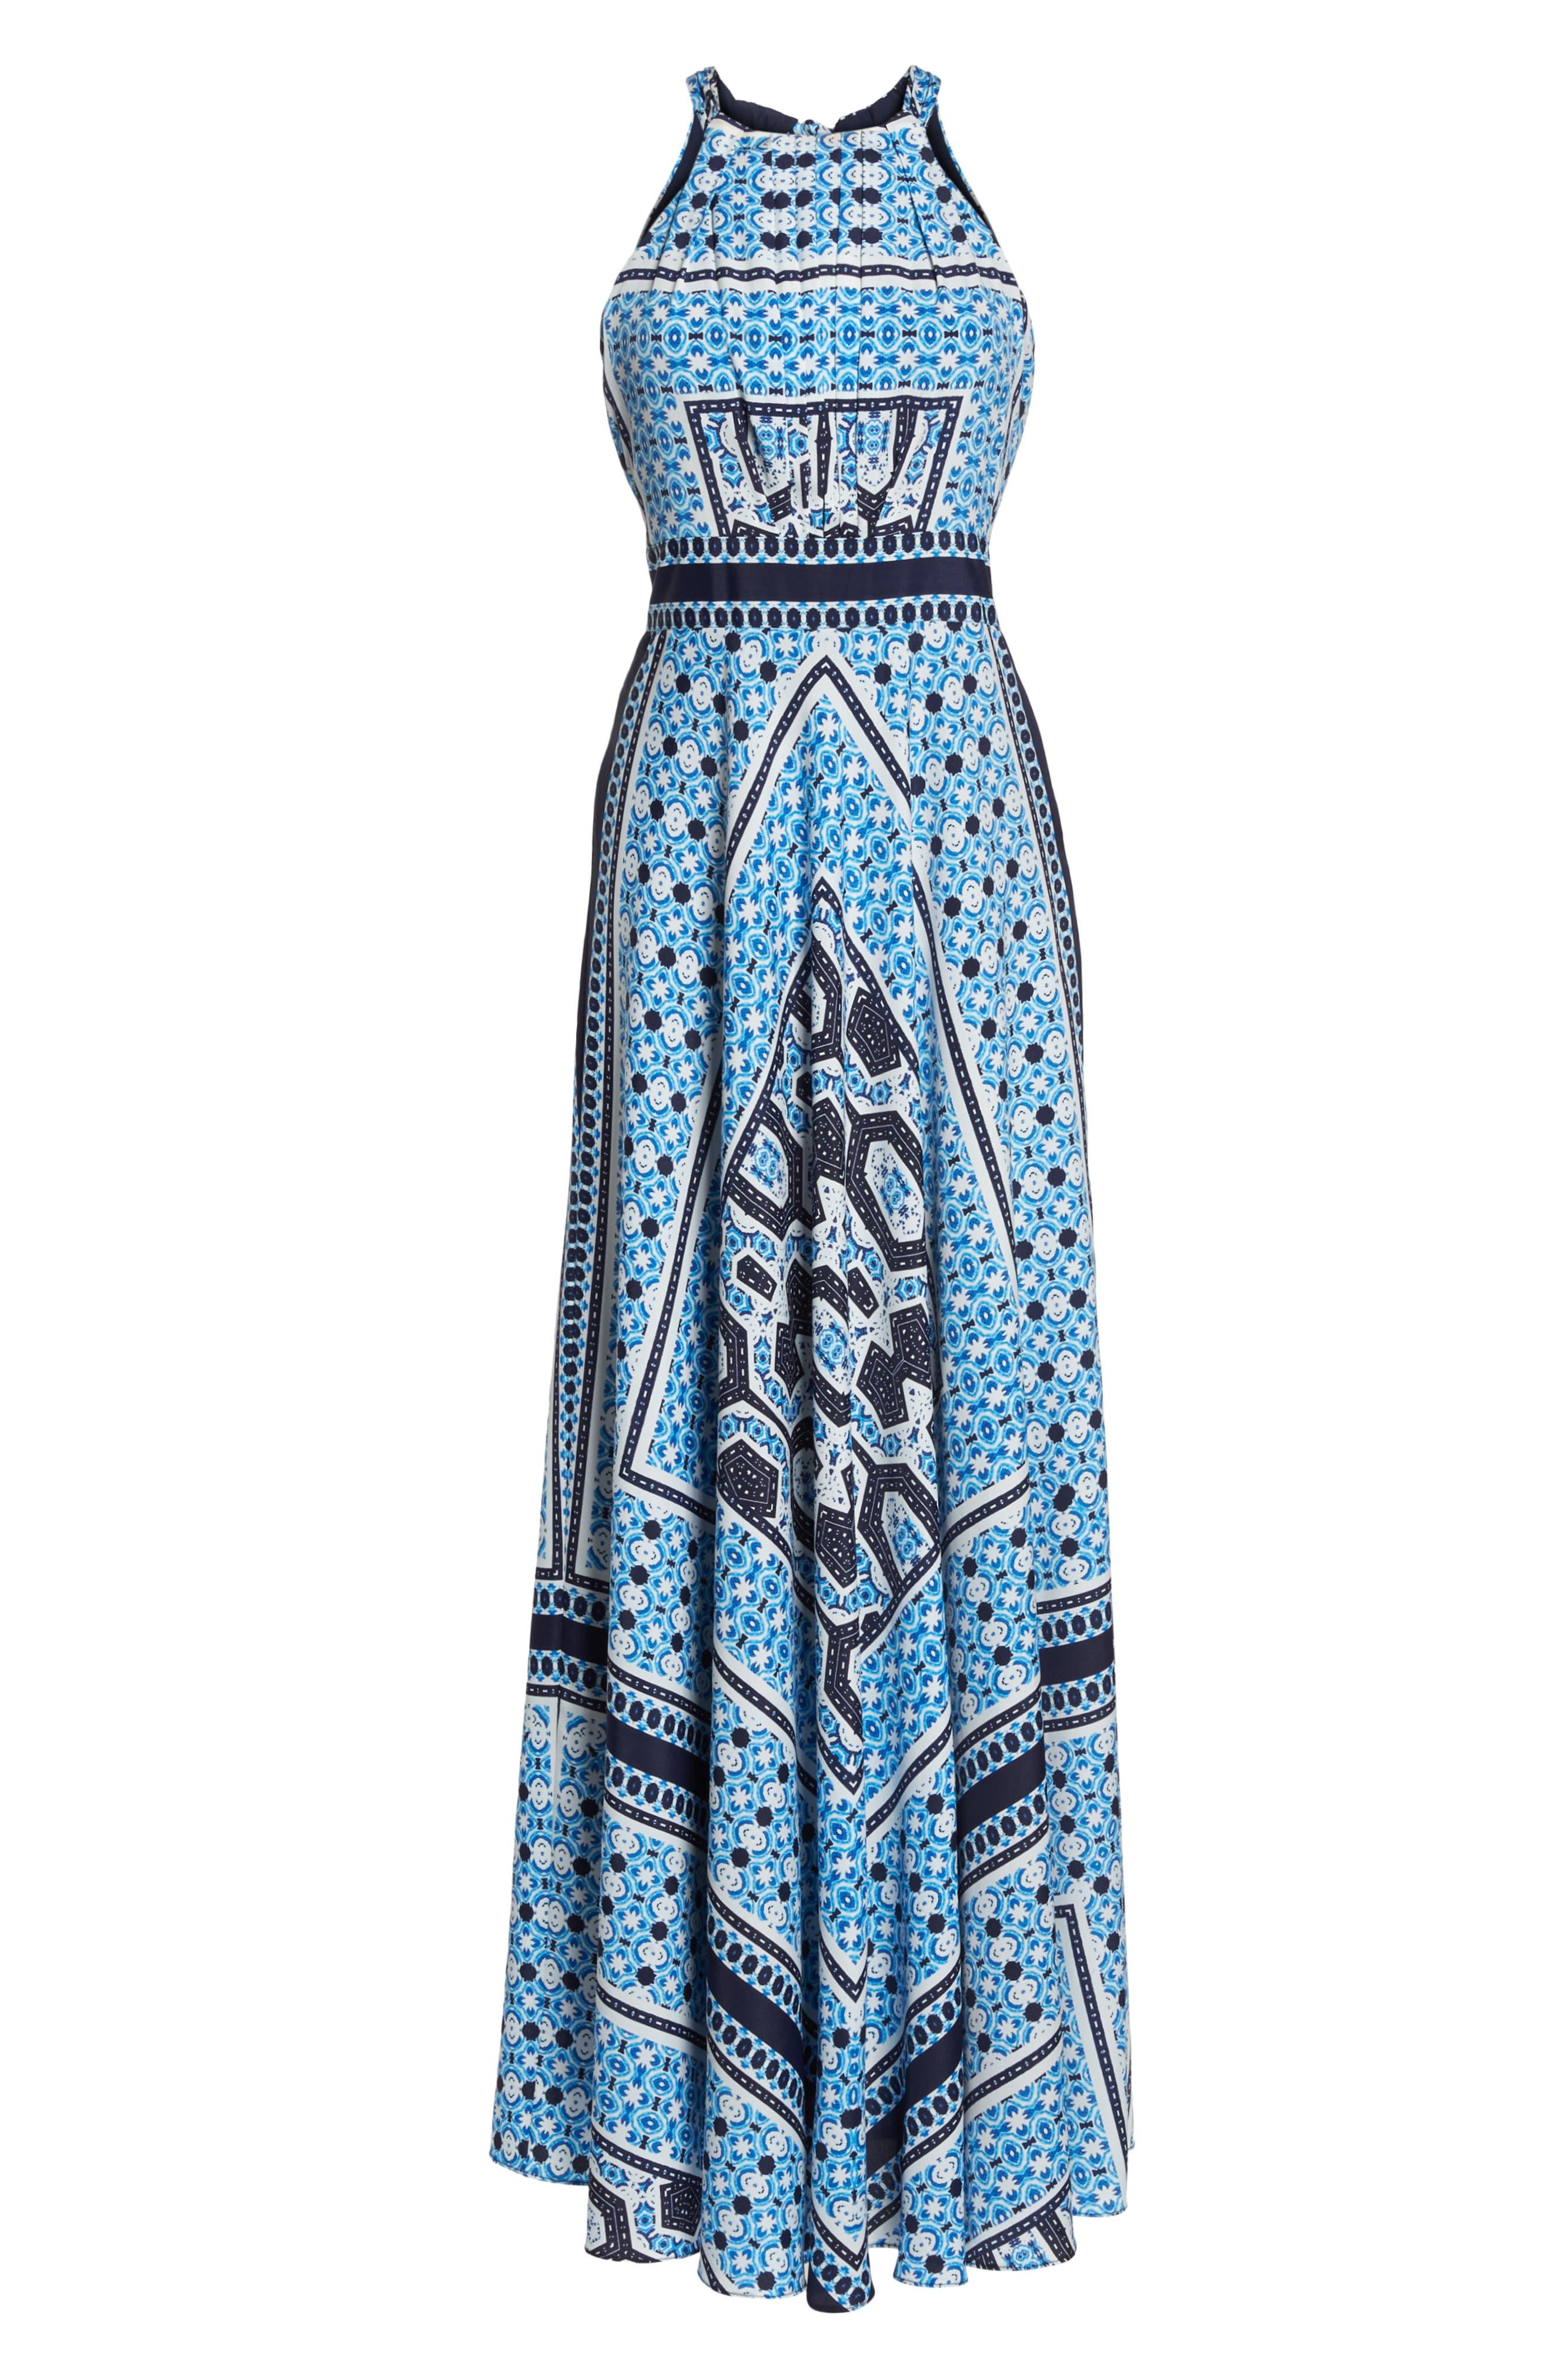 Scarf Print Halter Neck Maxi Dress,                             Alternate thumbnail 7, color,                             Blue